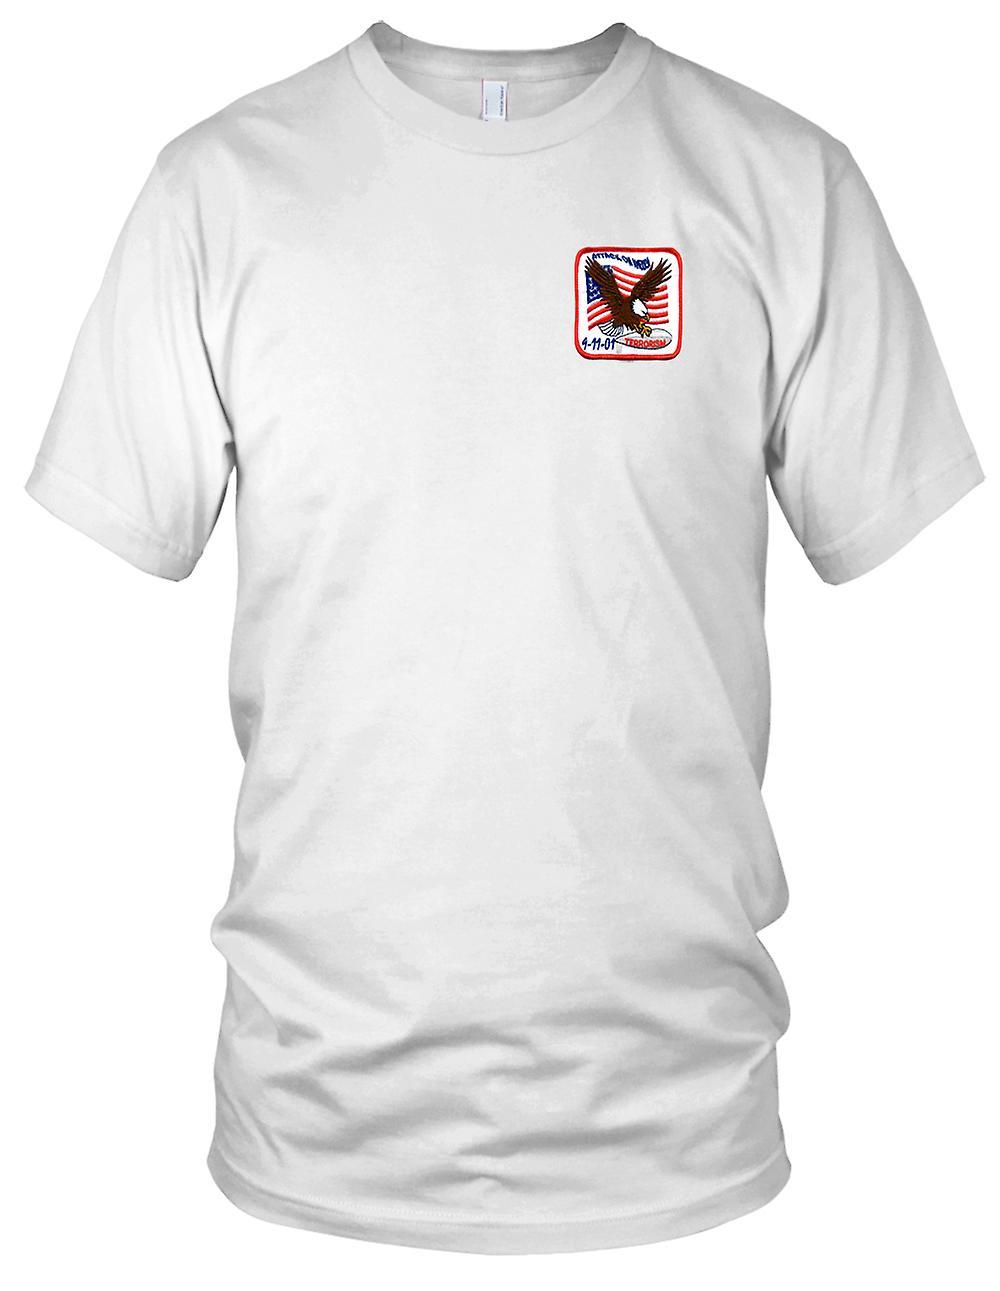 Angriff auf Amerika 11.09.01 Terror Flagge gestickt Patch - Kinder T Shirt